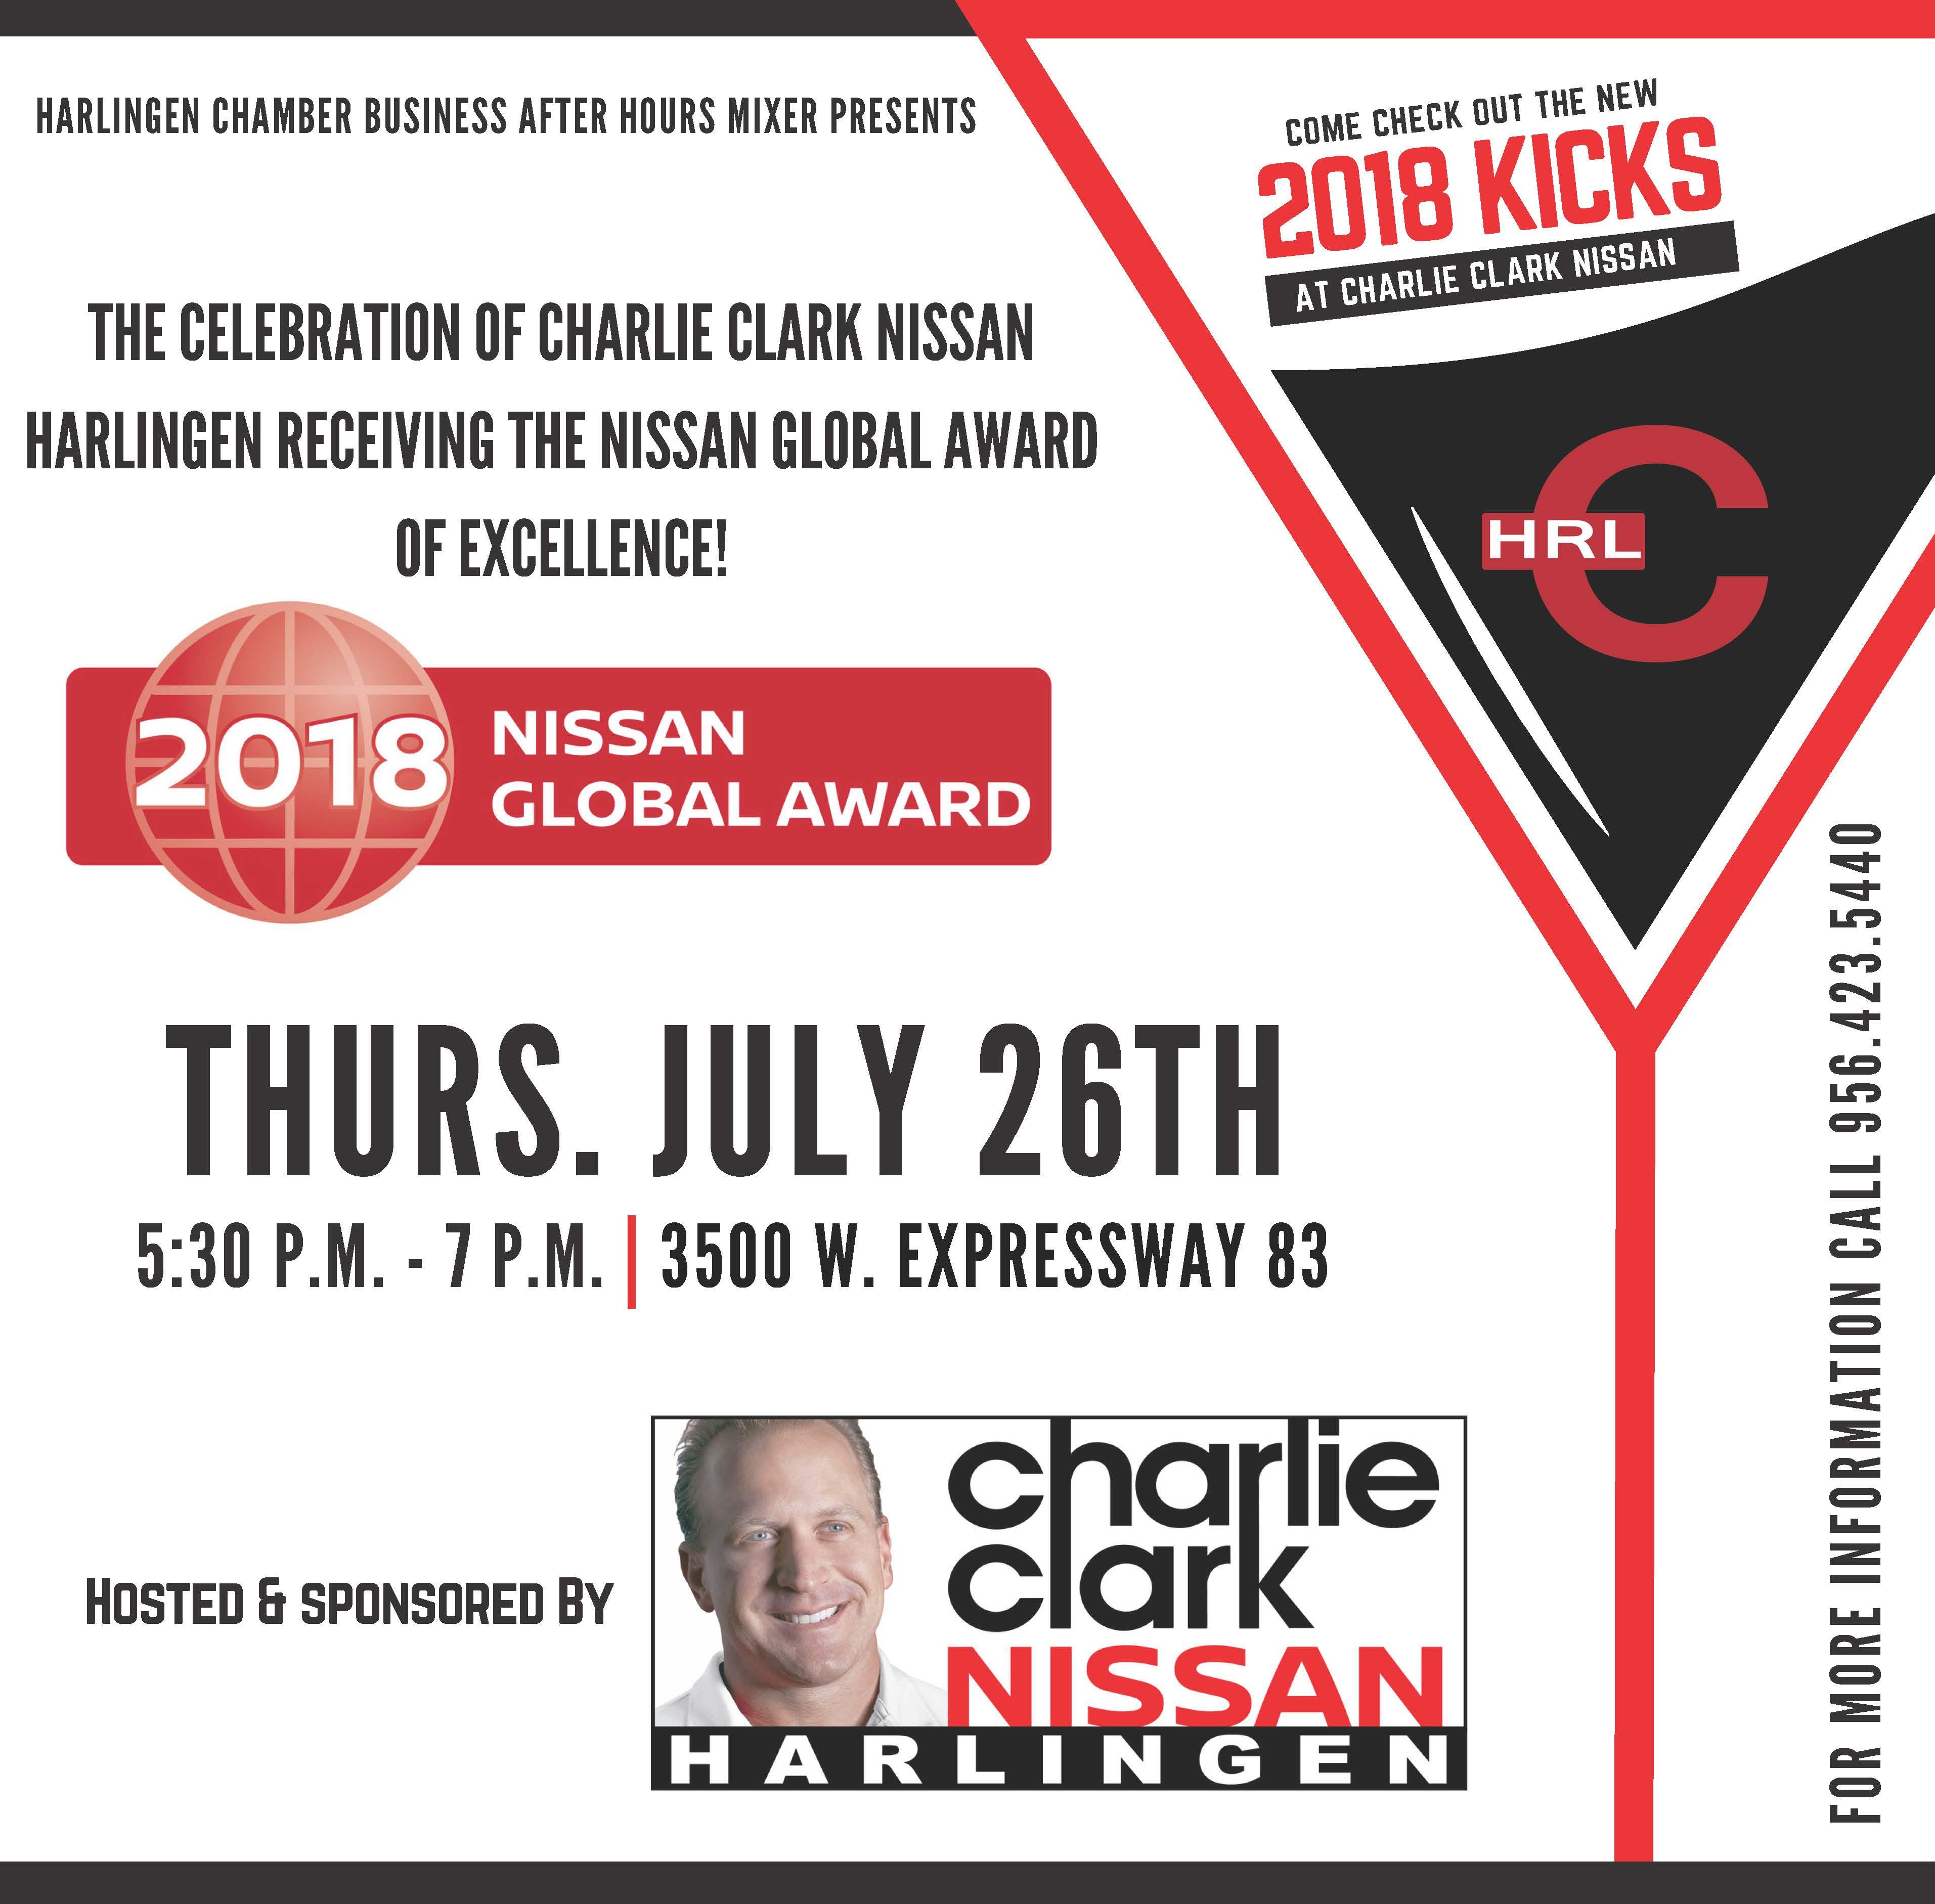 Business After Hours Mixer Charlie Clark Nissan Jul 26 2018